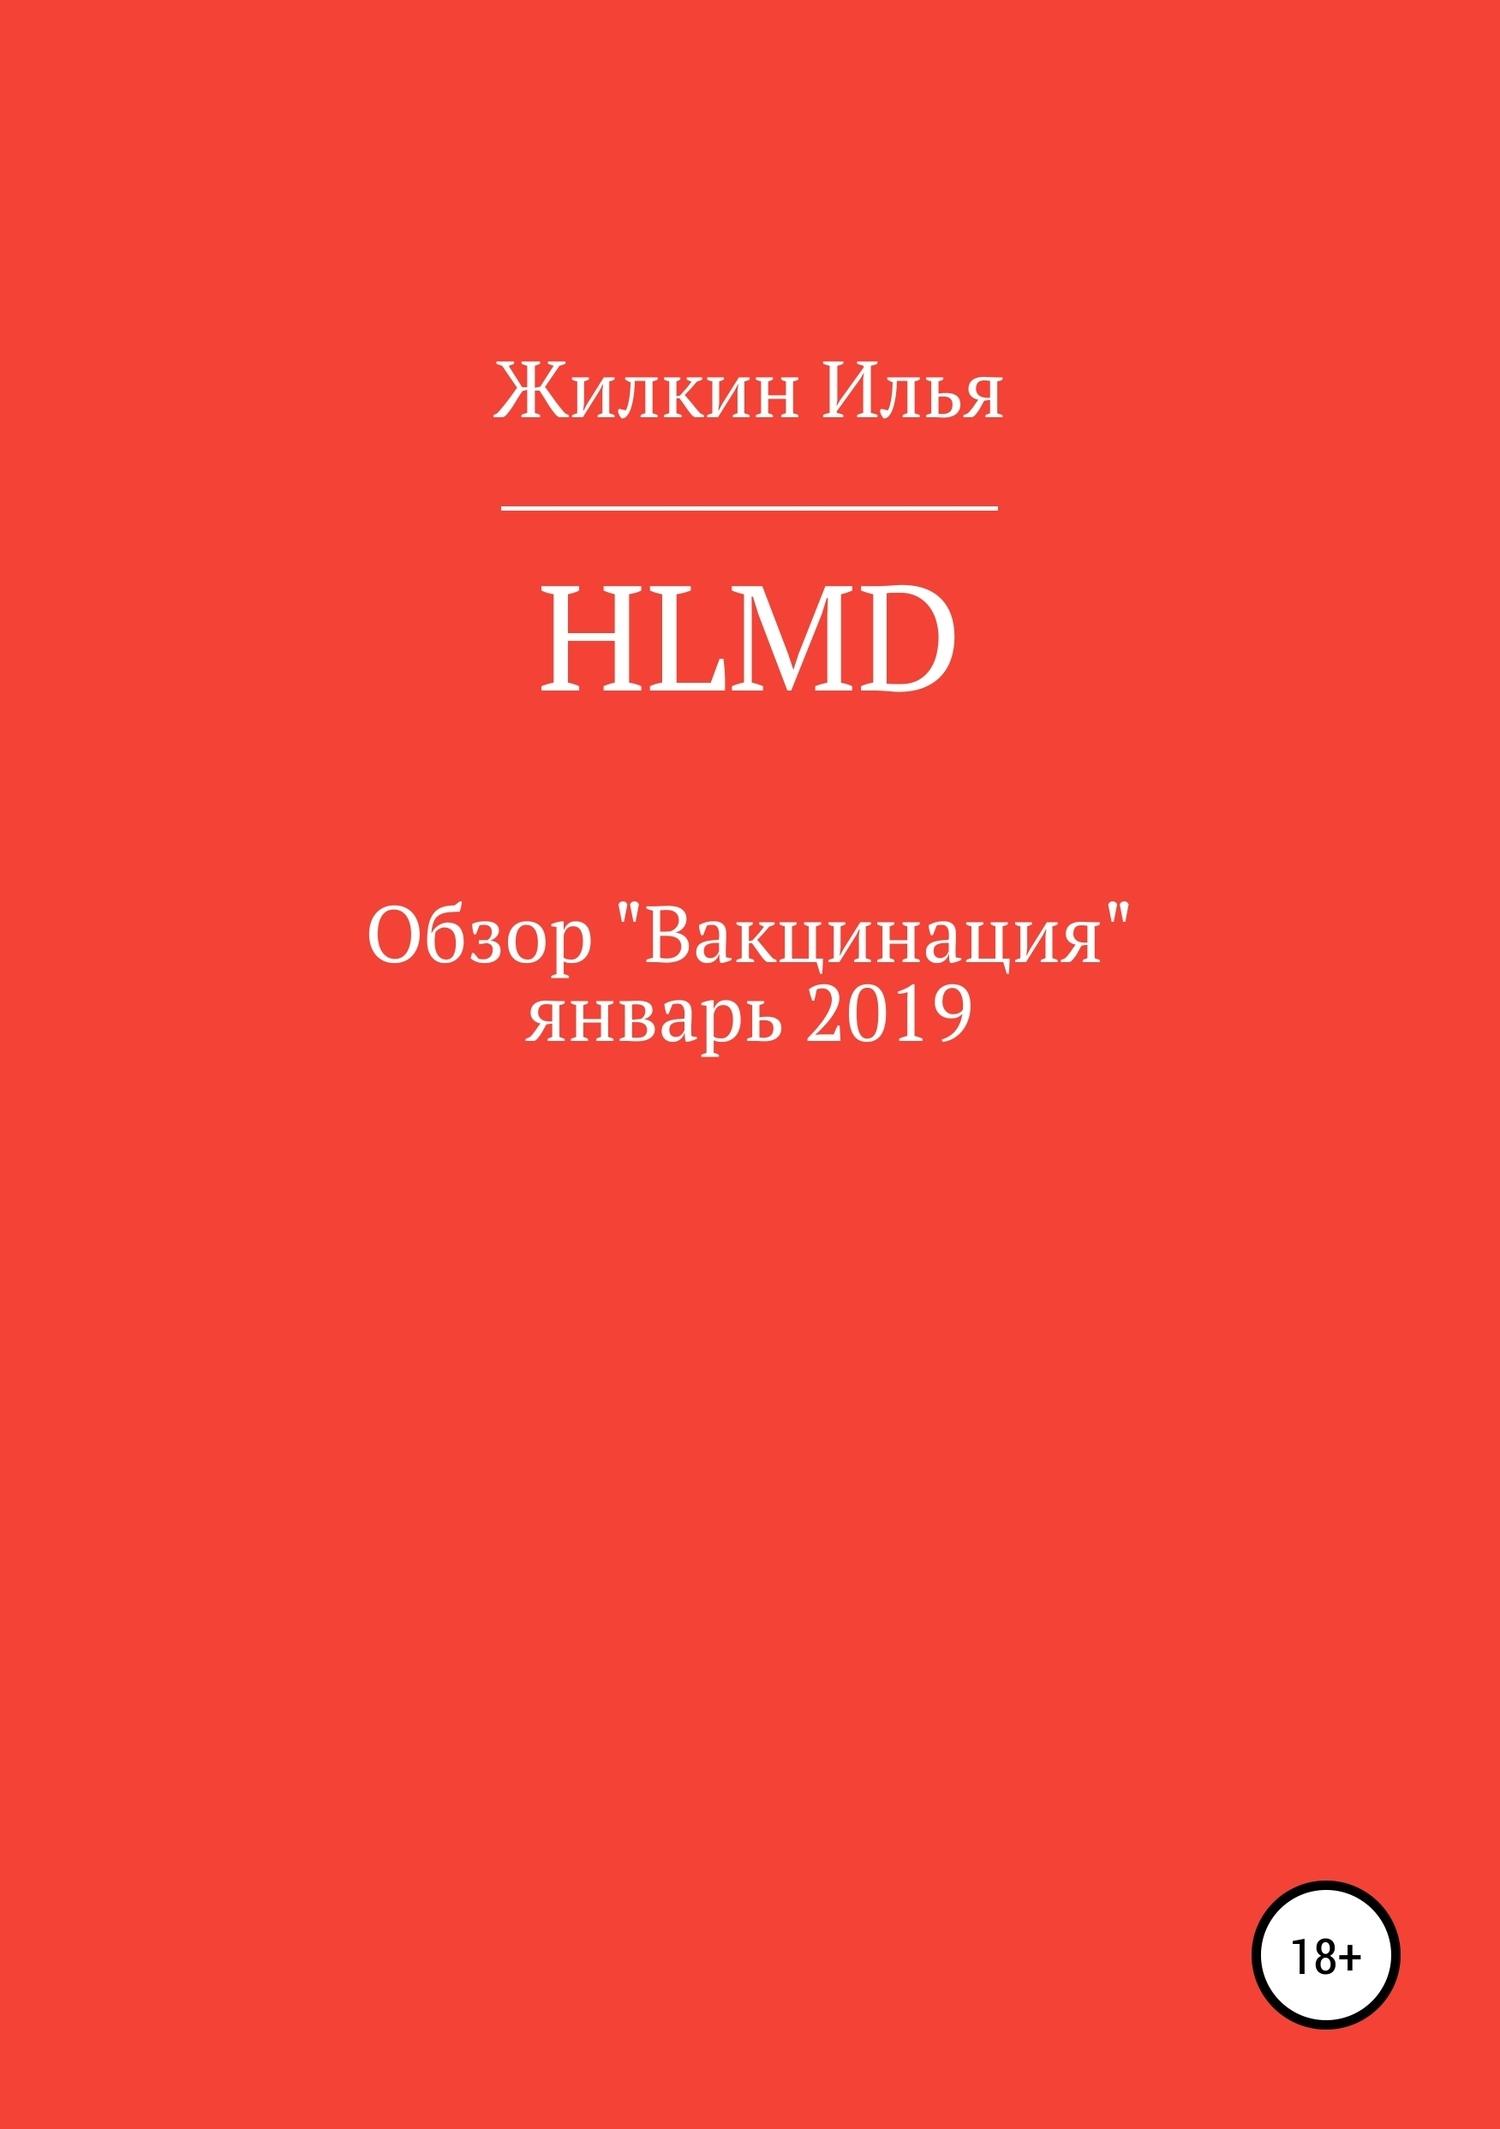 Обзор HLMD «Вакцинация»: январь 2019